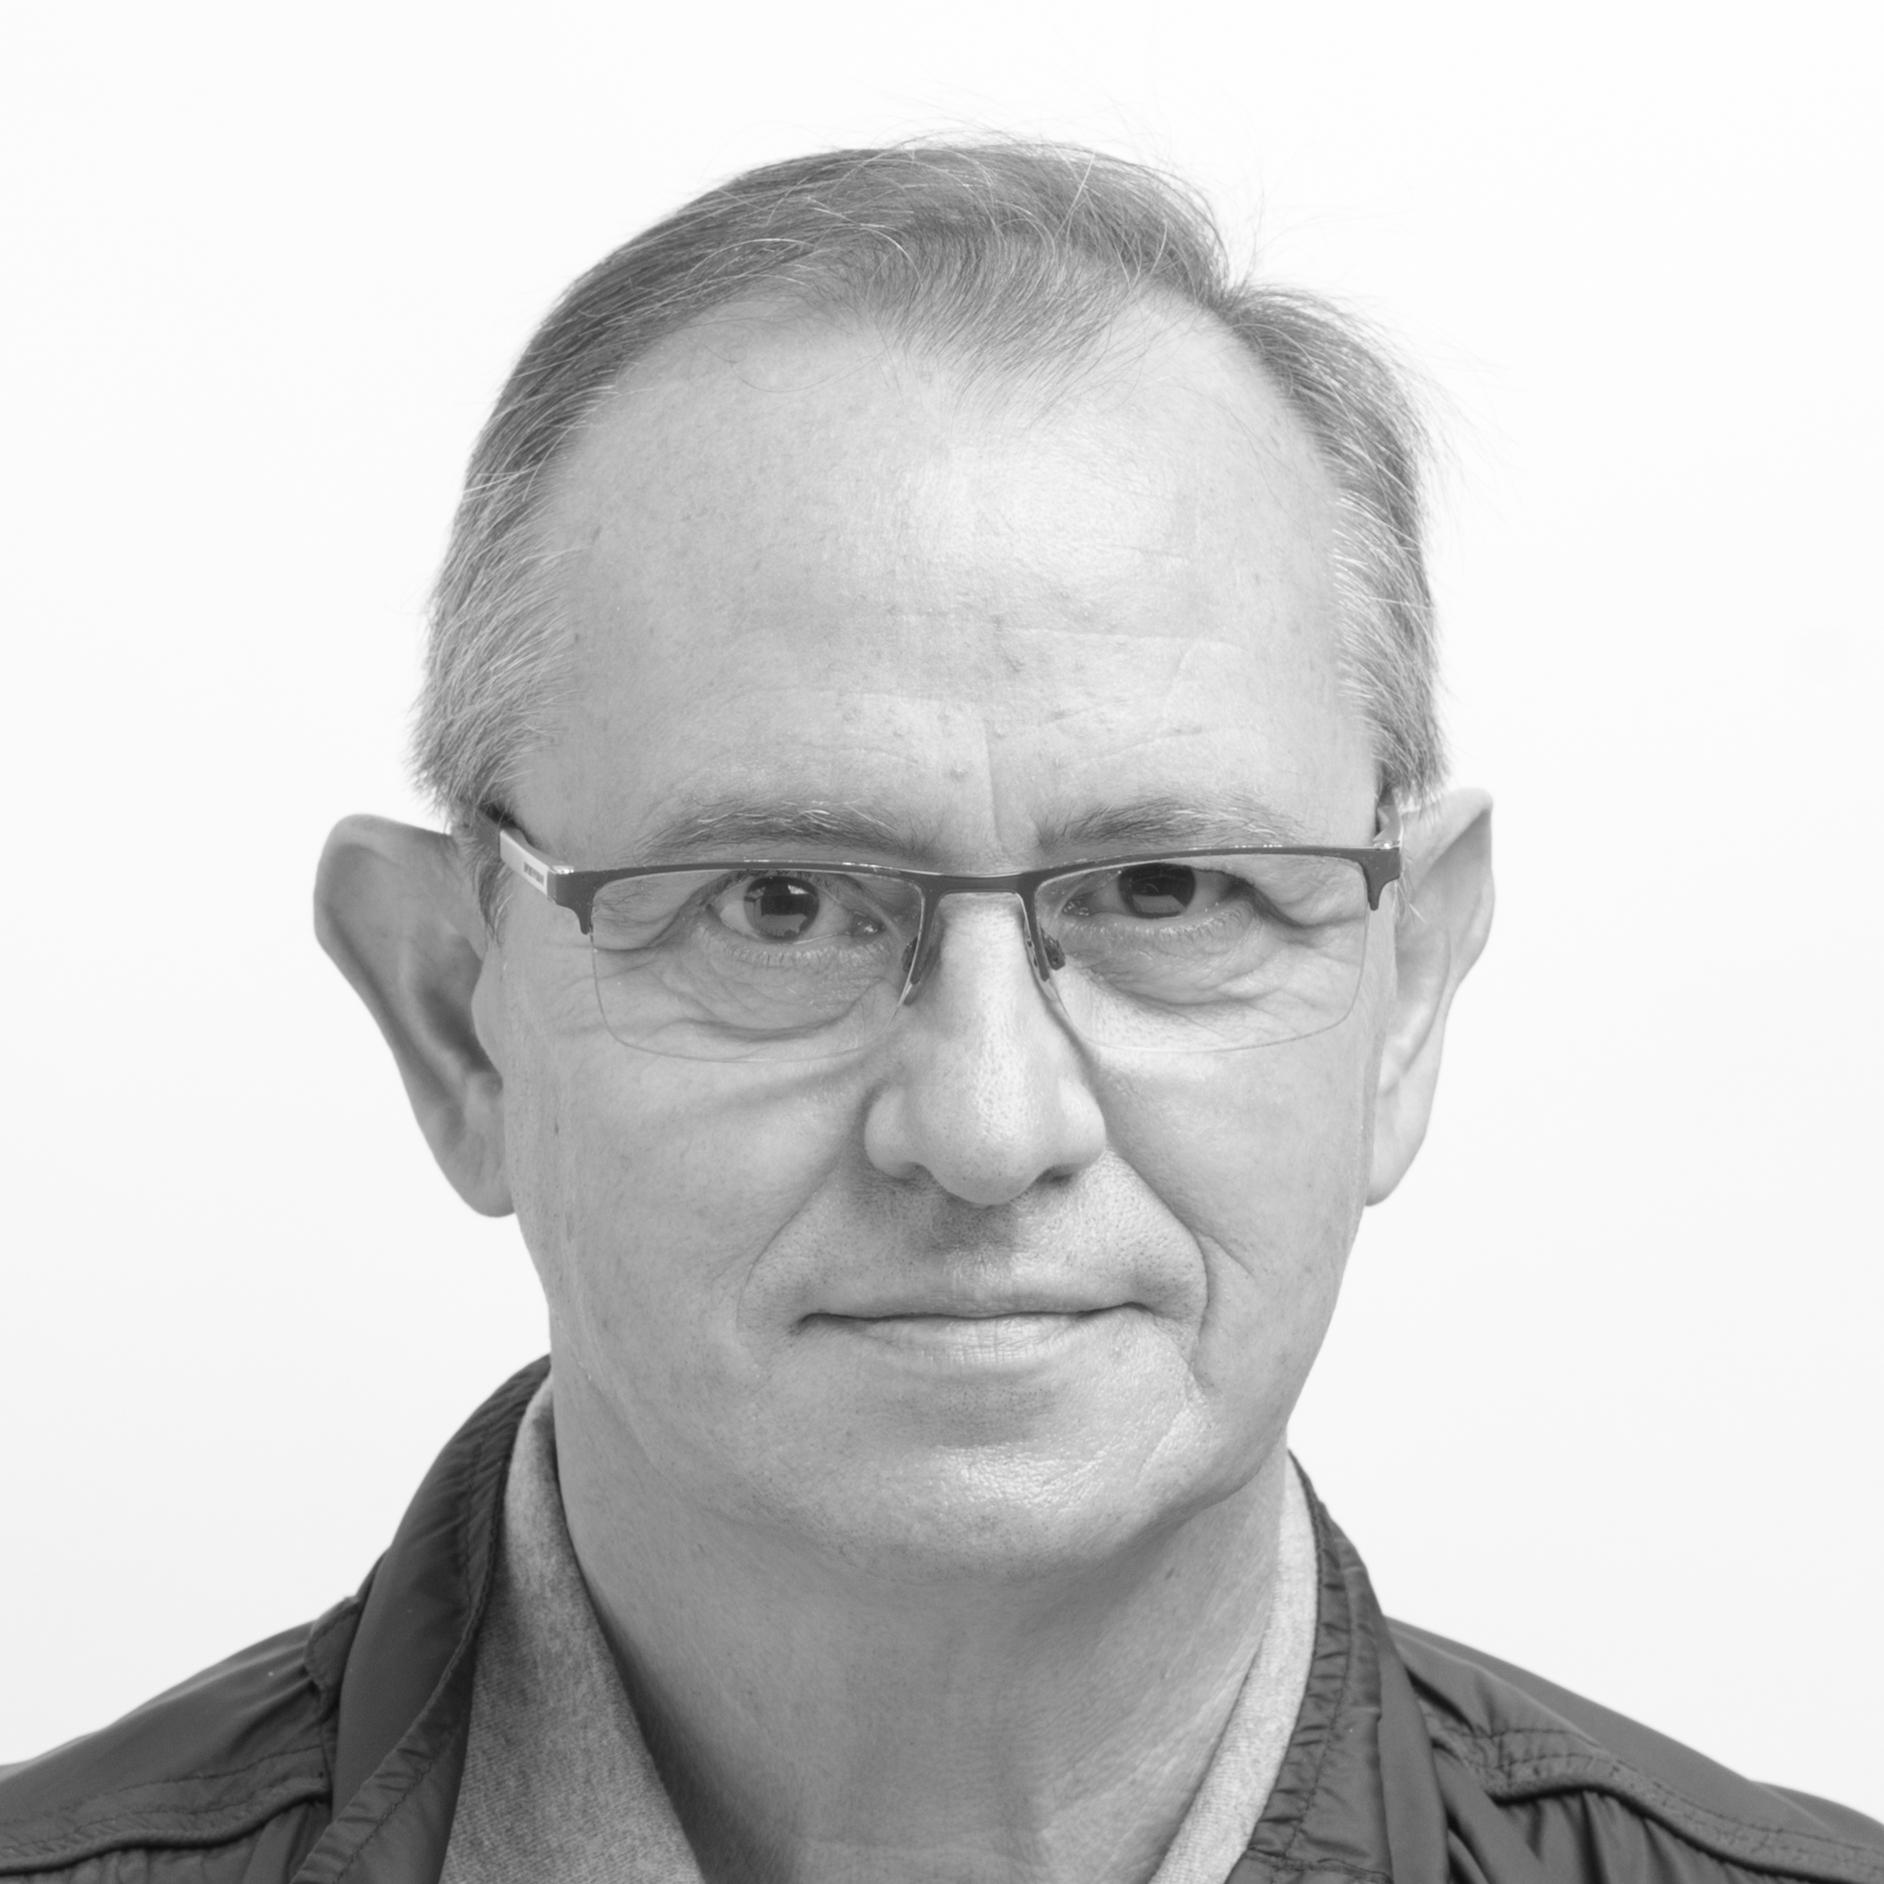 Miquel Alberola